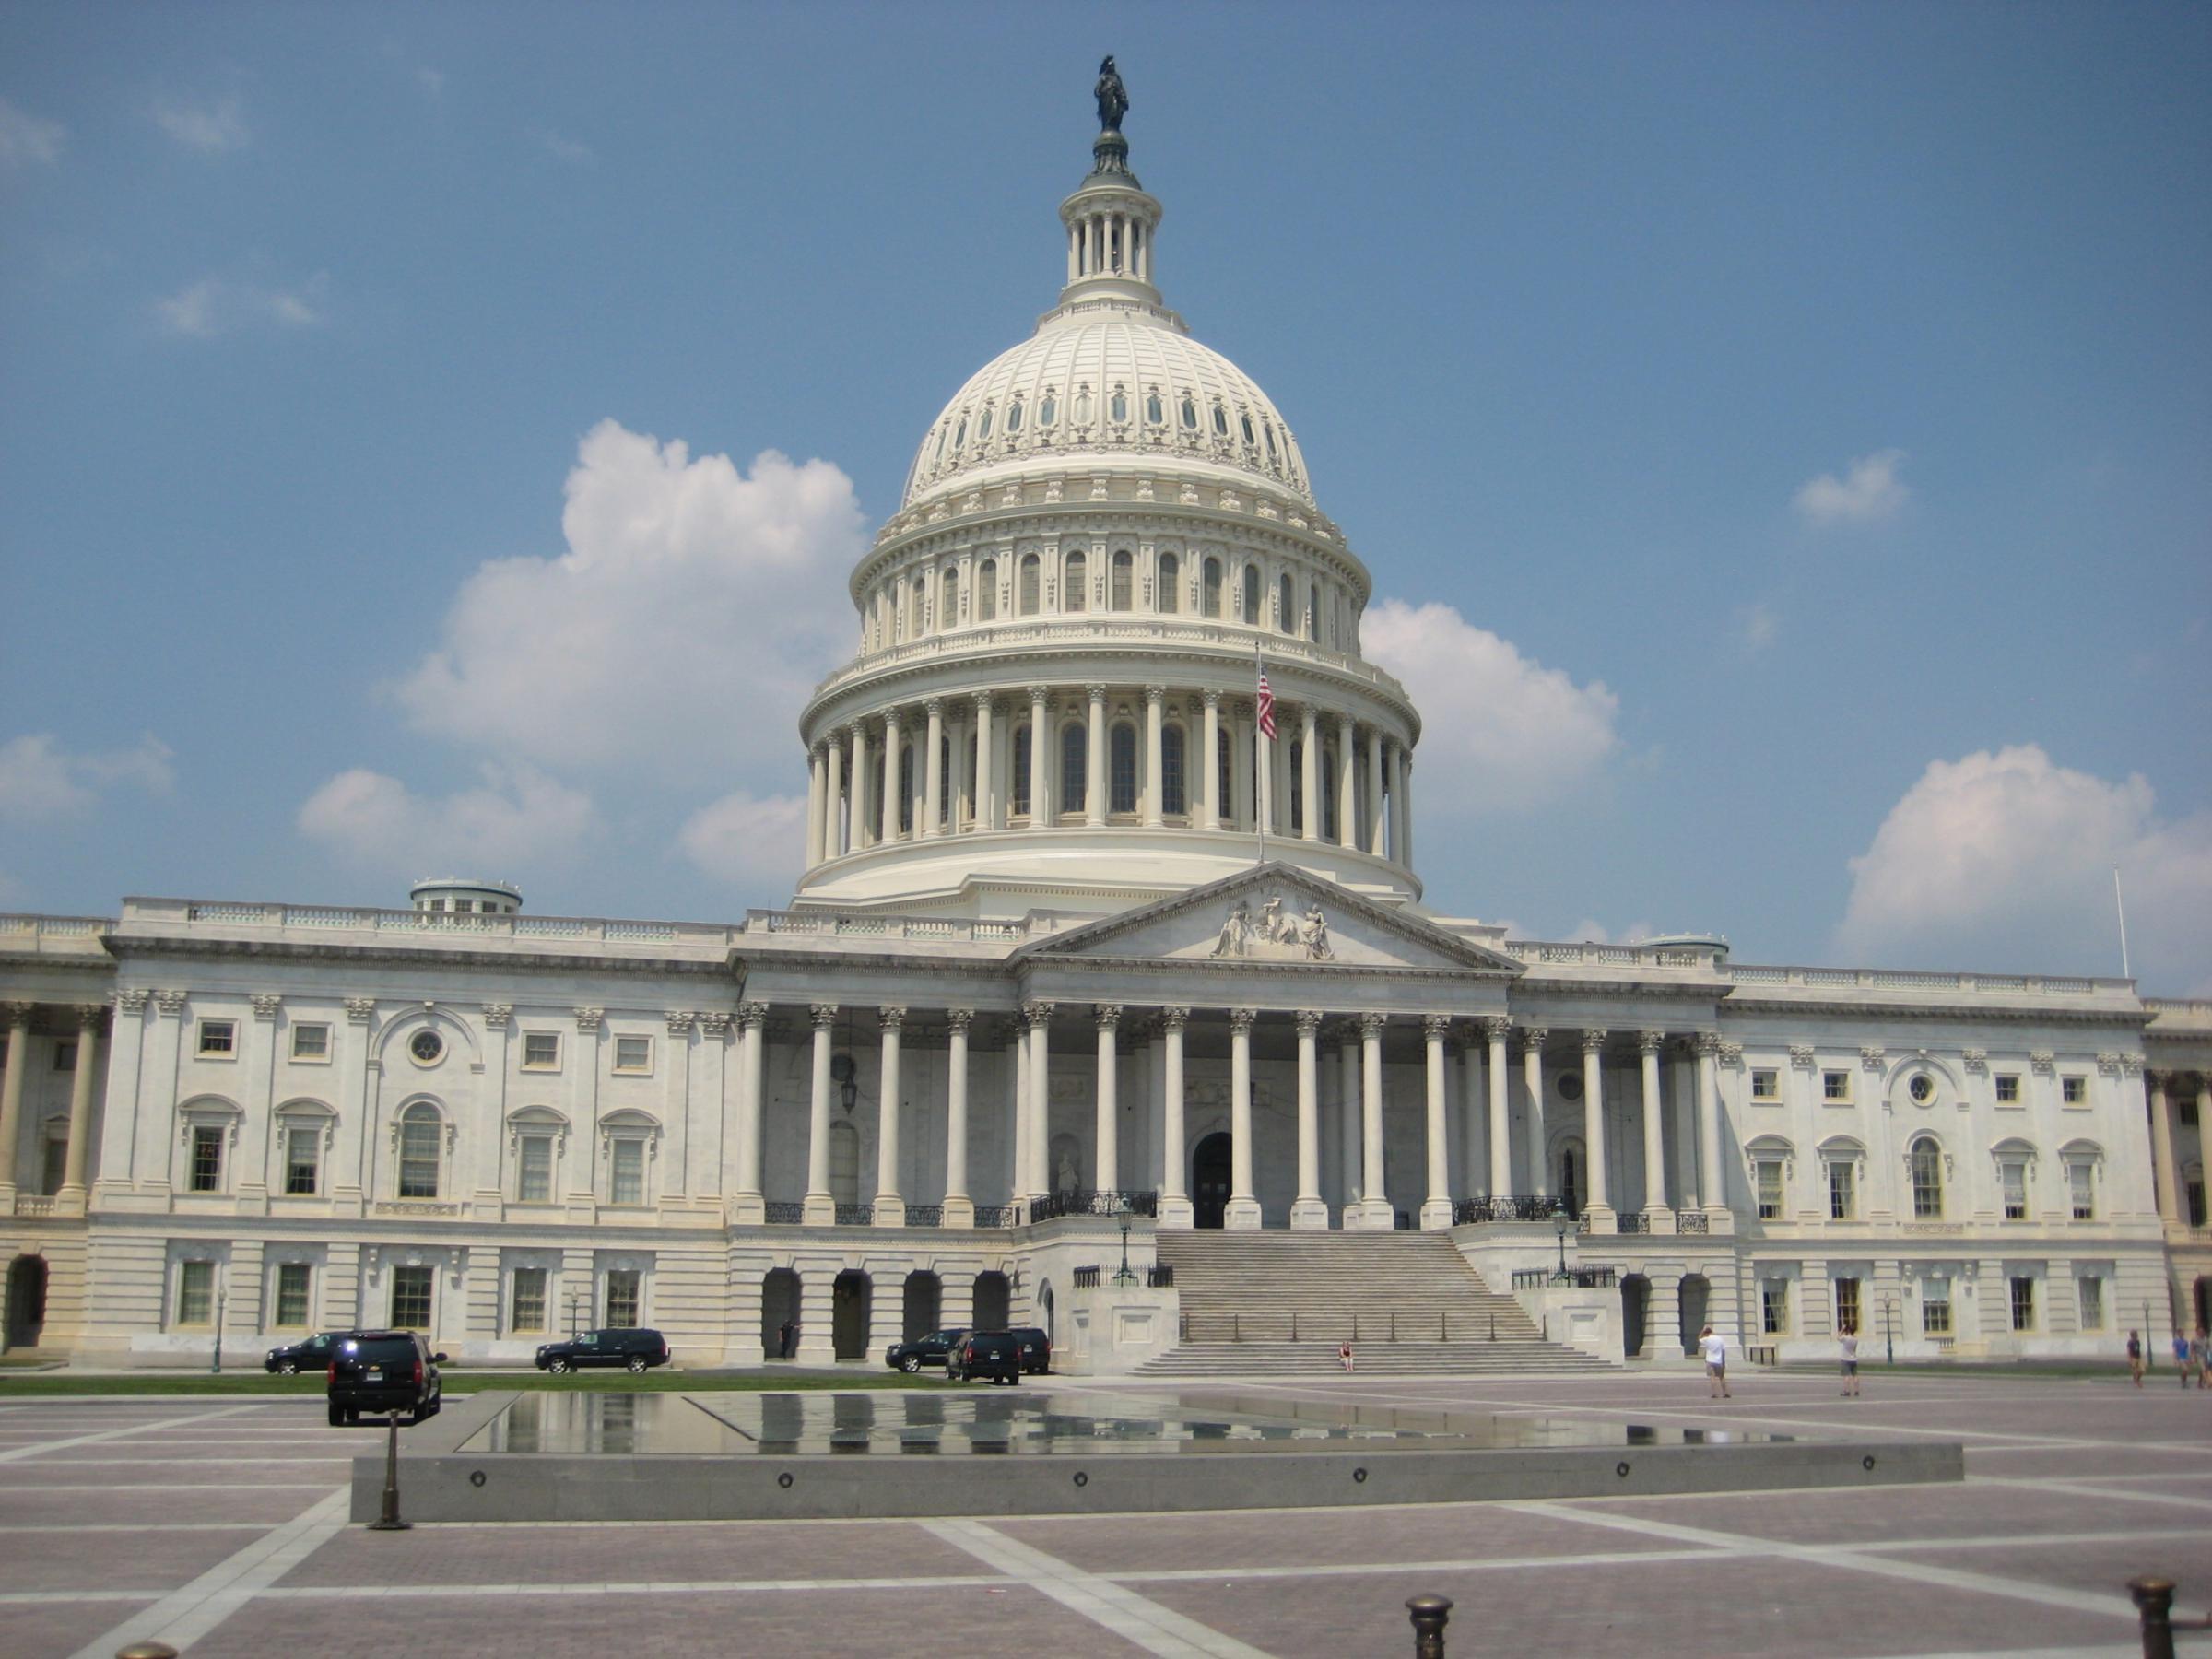 Rep. Fudge won't run for House speaker, backs Pelosi